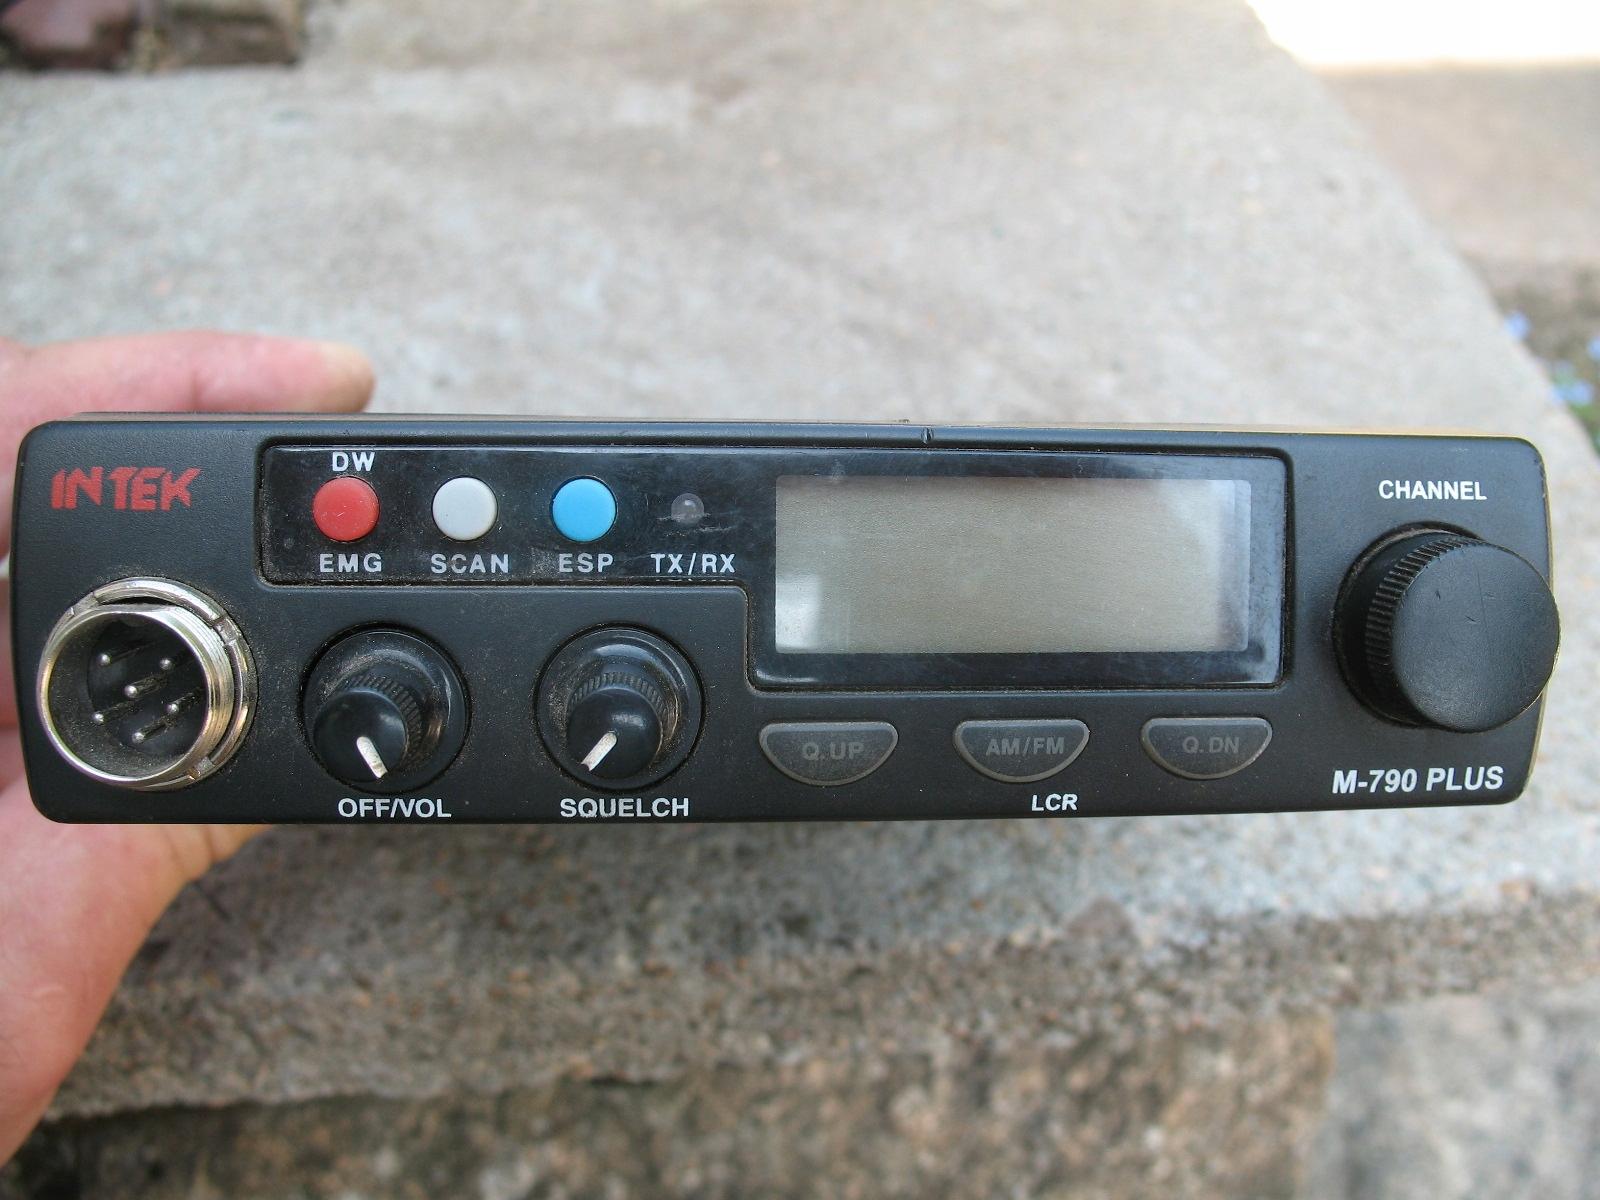 INTEK M-790 PLUS